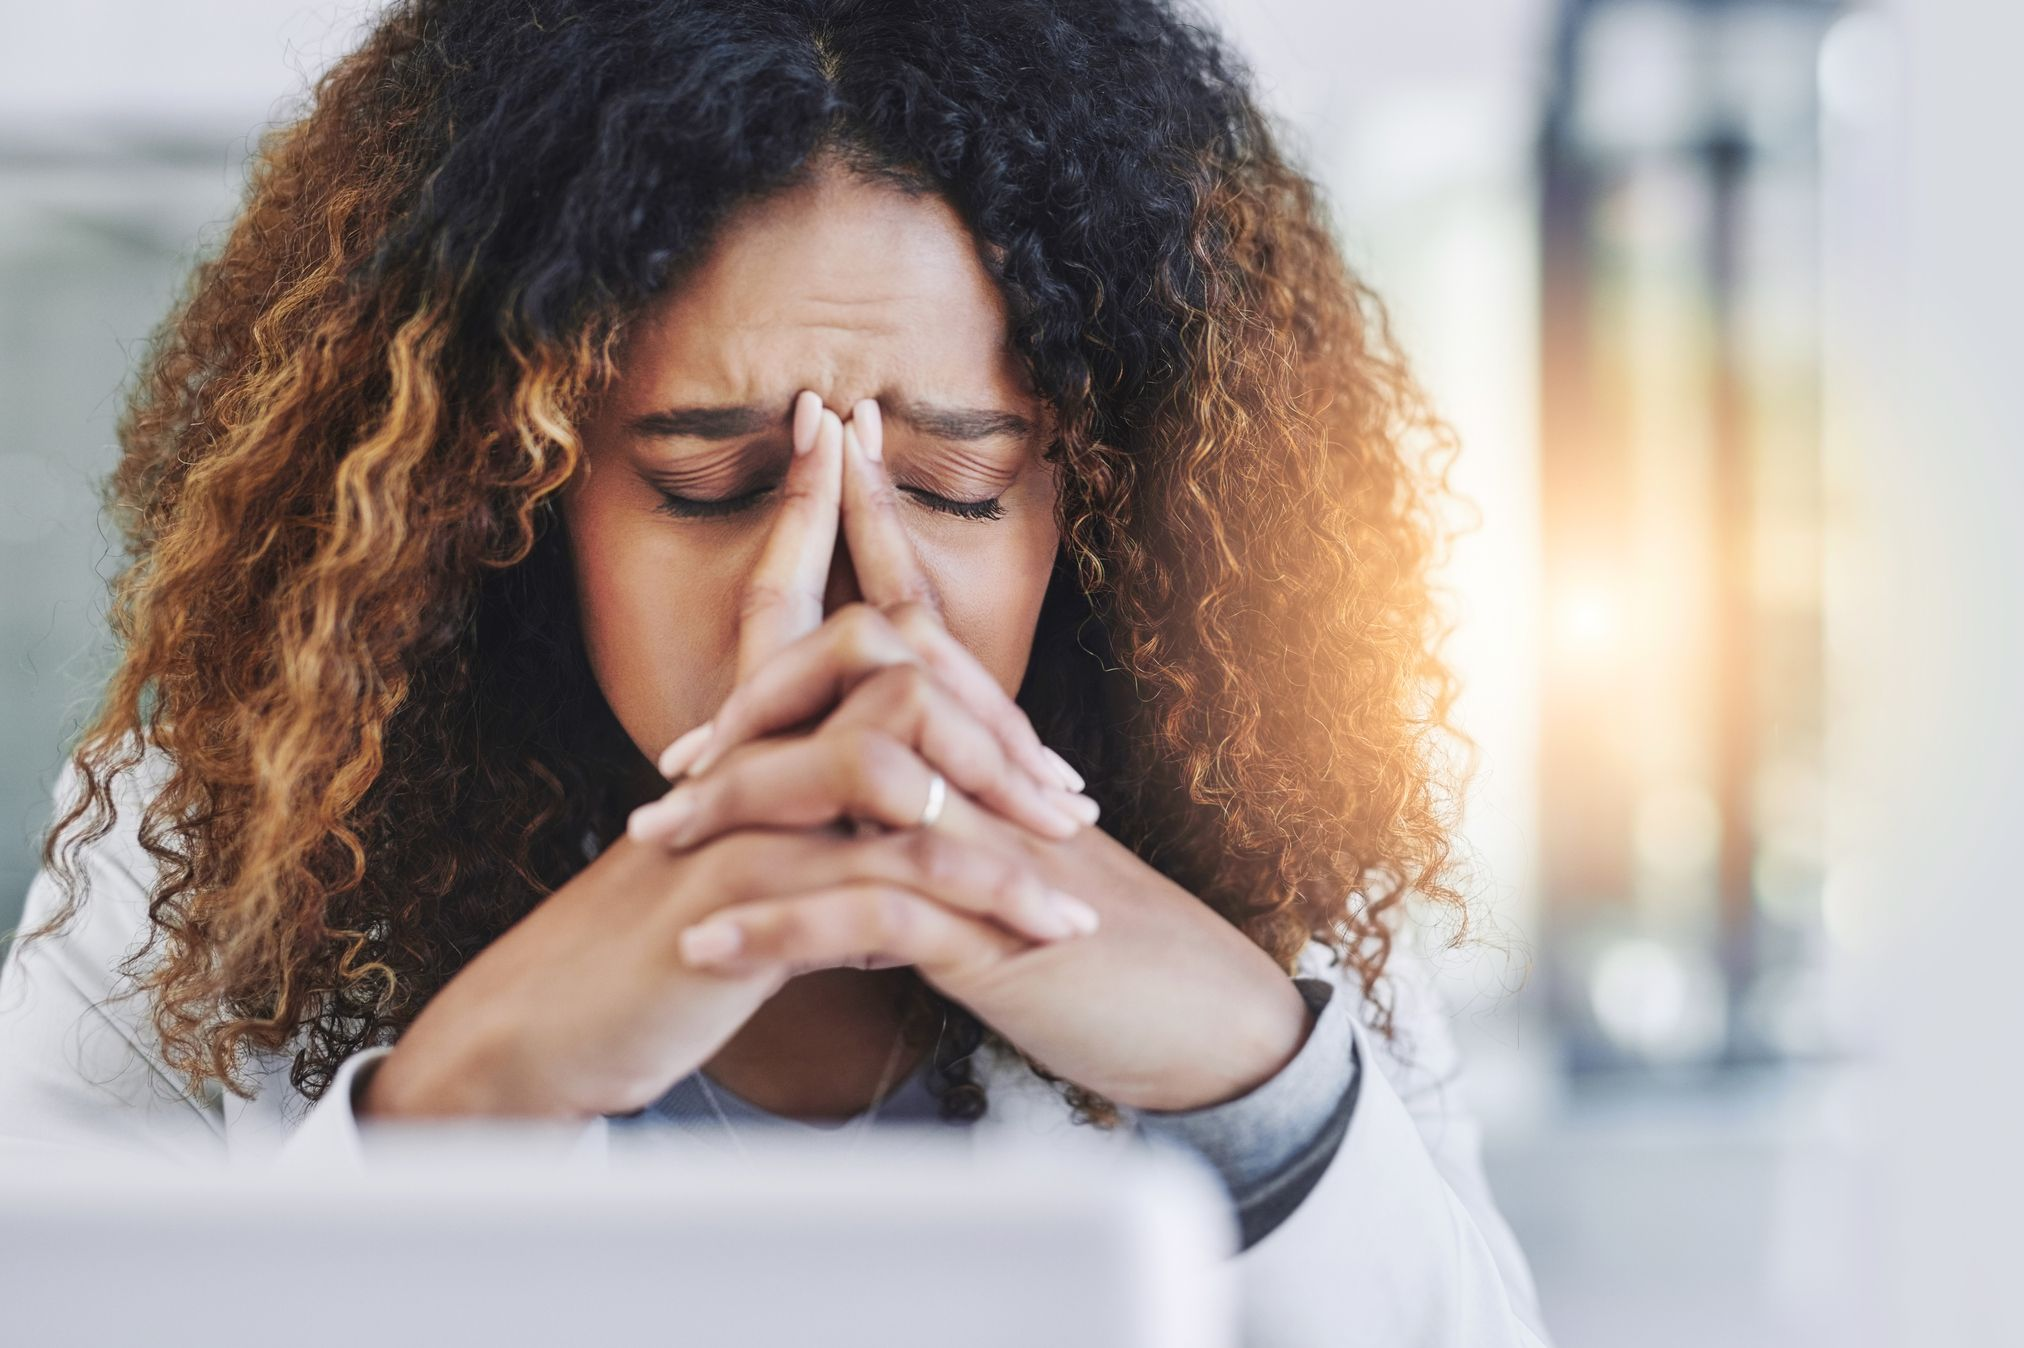 stress symptoms - headaches